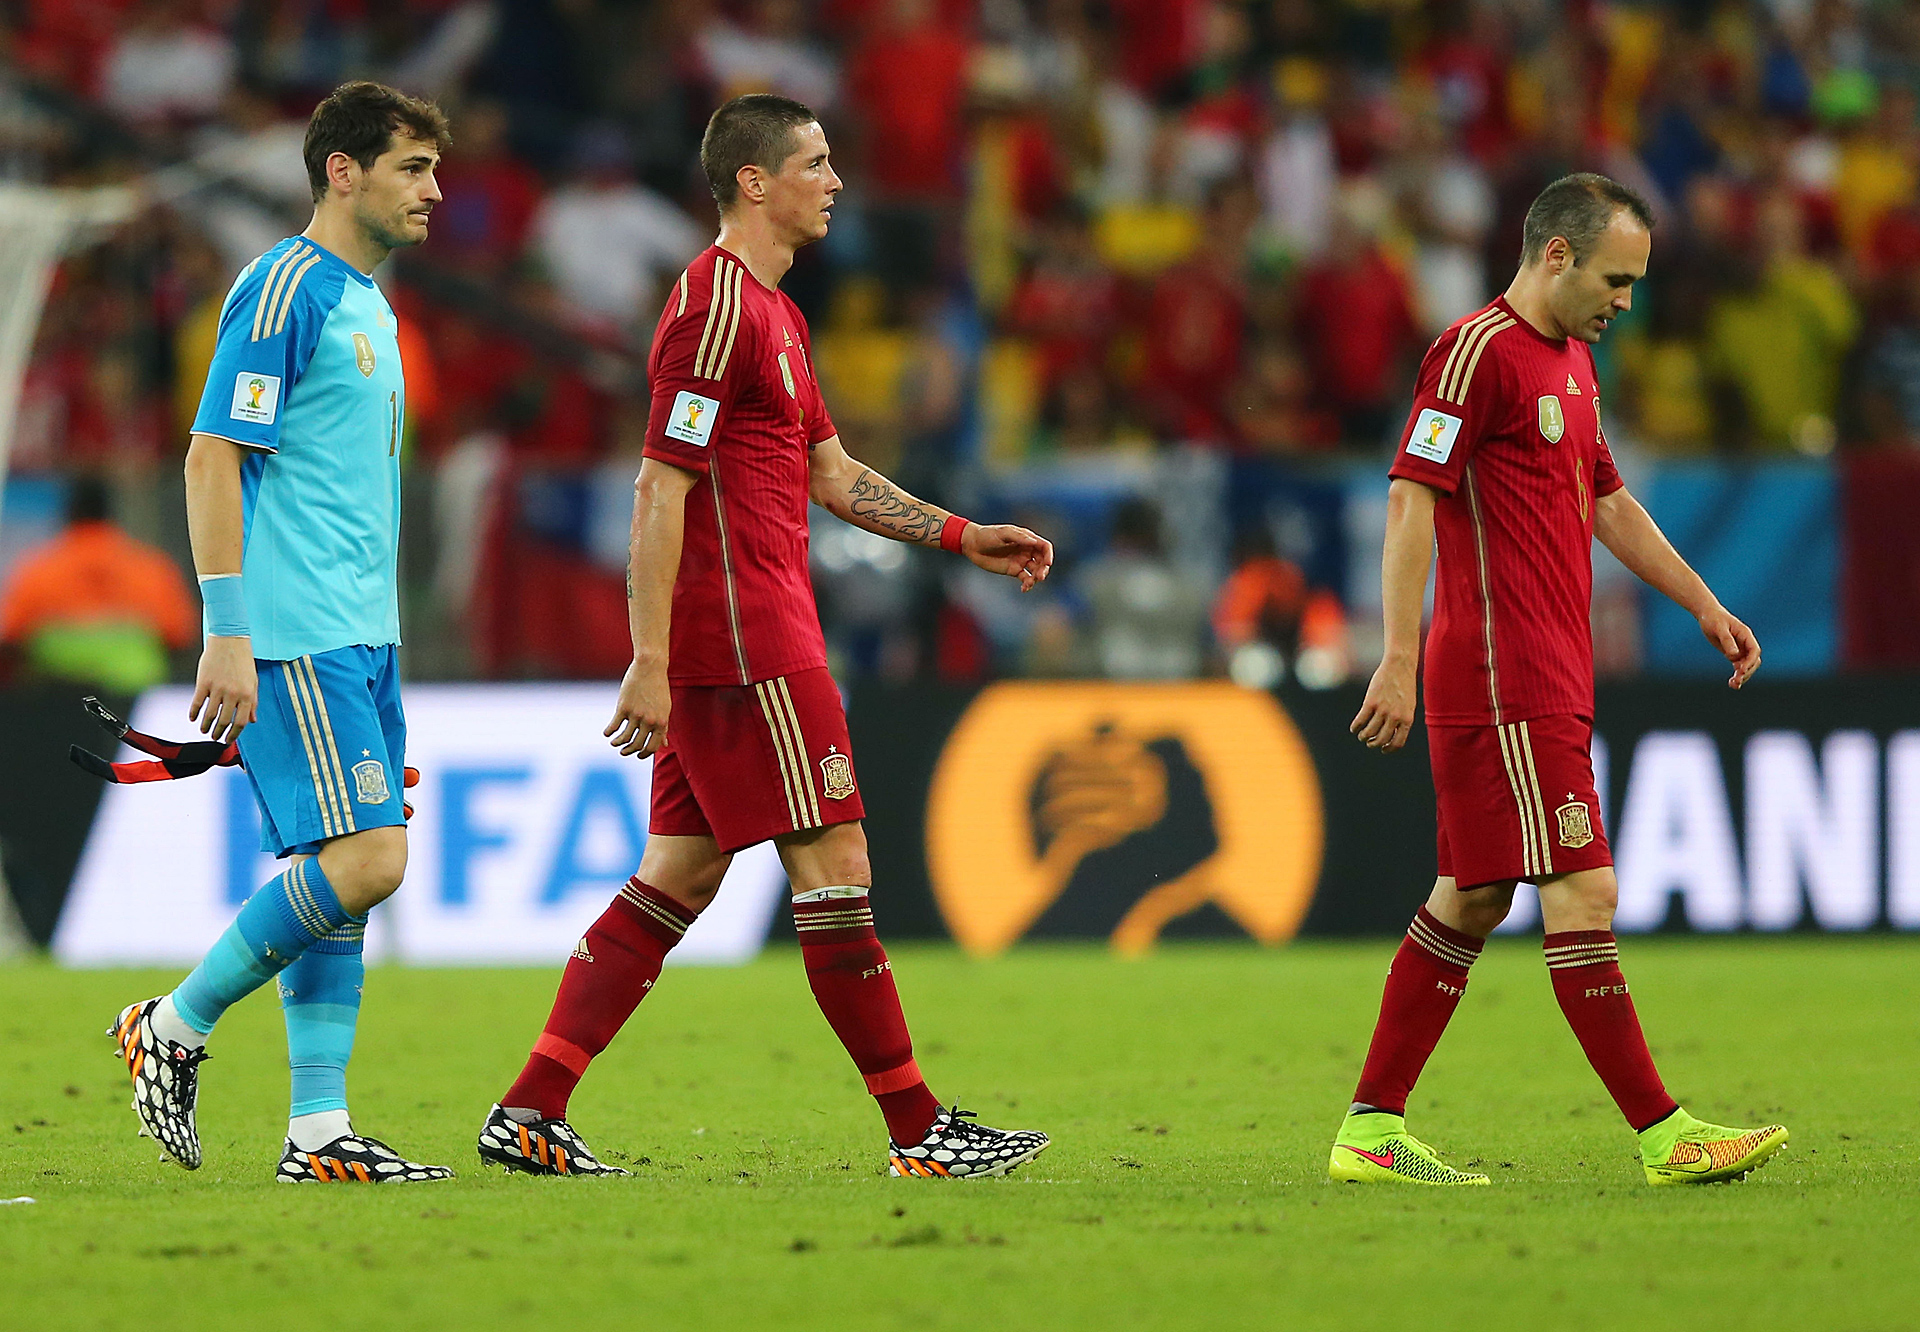 Iker Casillas Fernando Torres Andreas Iniesta Spain Chile 2014 World Cup 06182014